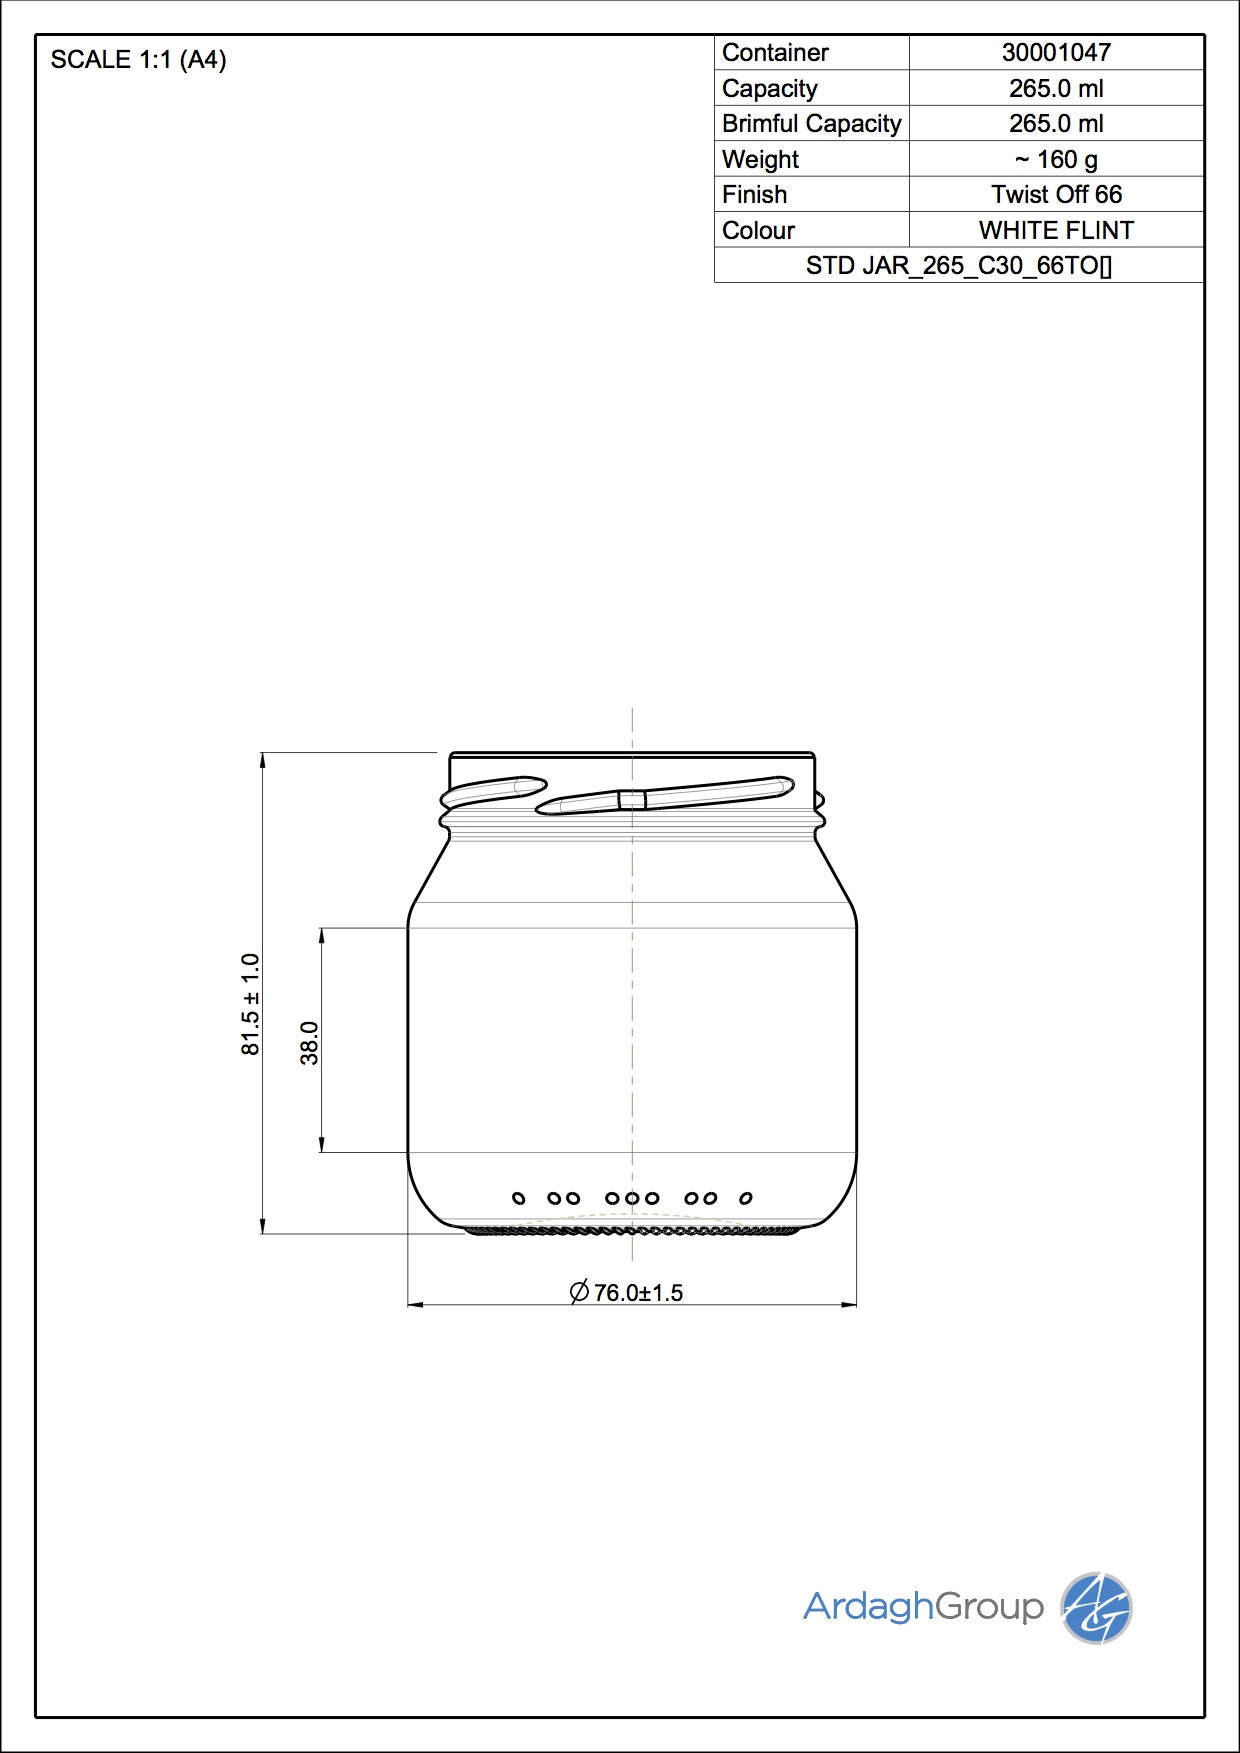 STD JAR 265 C30 66TO